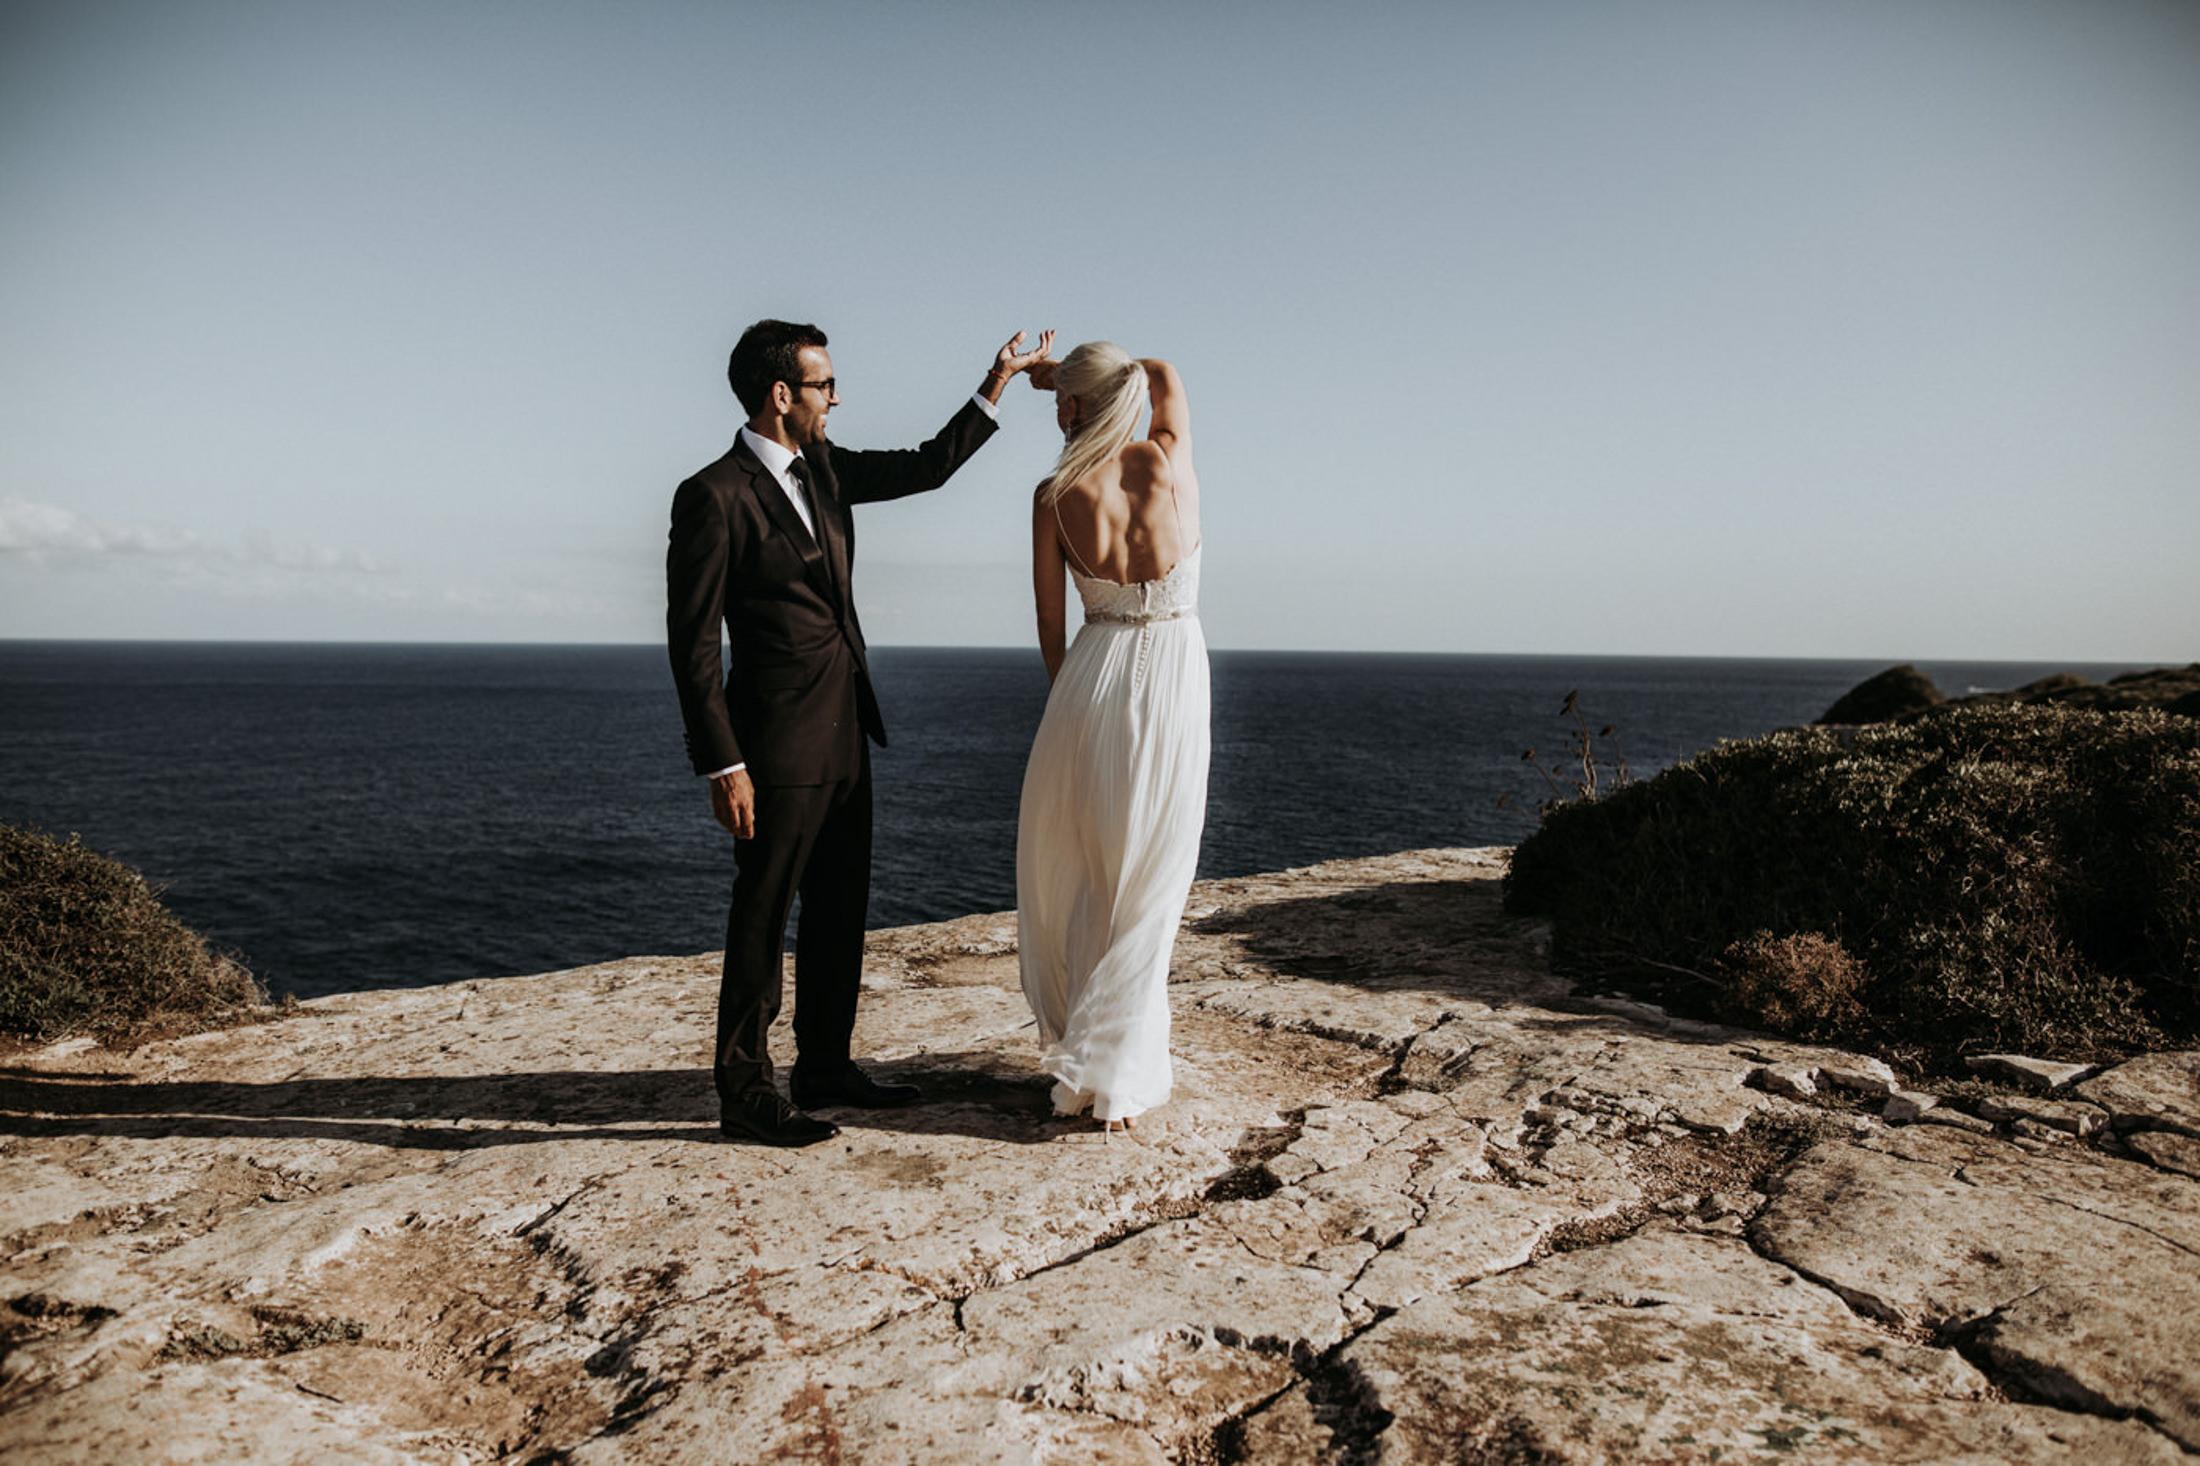 Wedding_Photographer_Mallorca_Daniela-Marquardt_Photography_New_York_Iceland_Tuscany_Santorini_Portugal_Austria_Bavaria_Elopement_Hochzeitsfotograf_AntjeRajat2_83